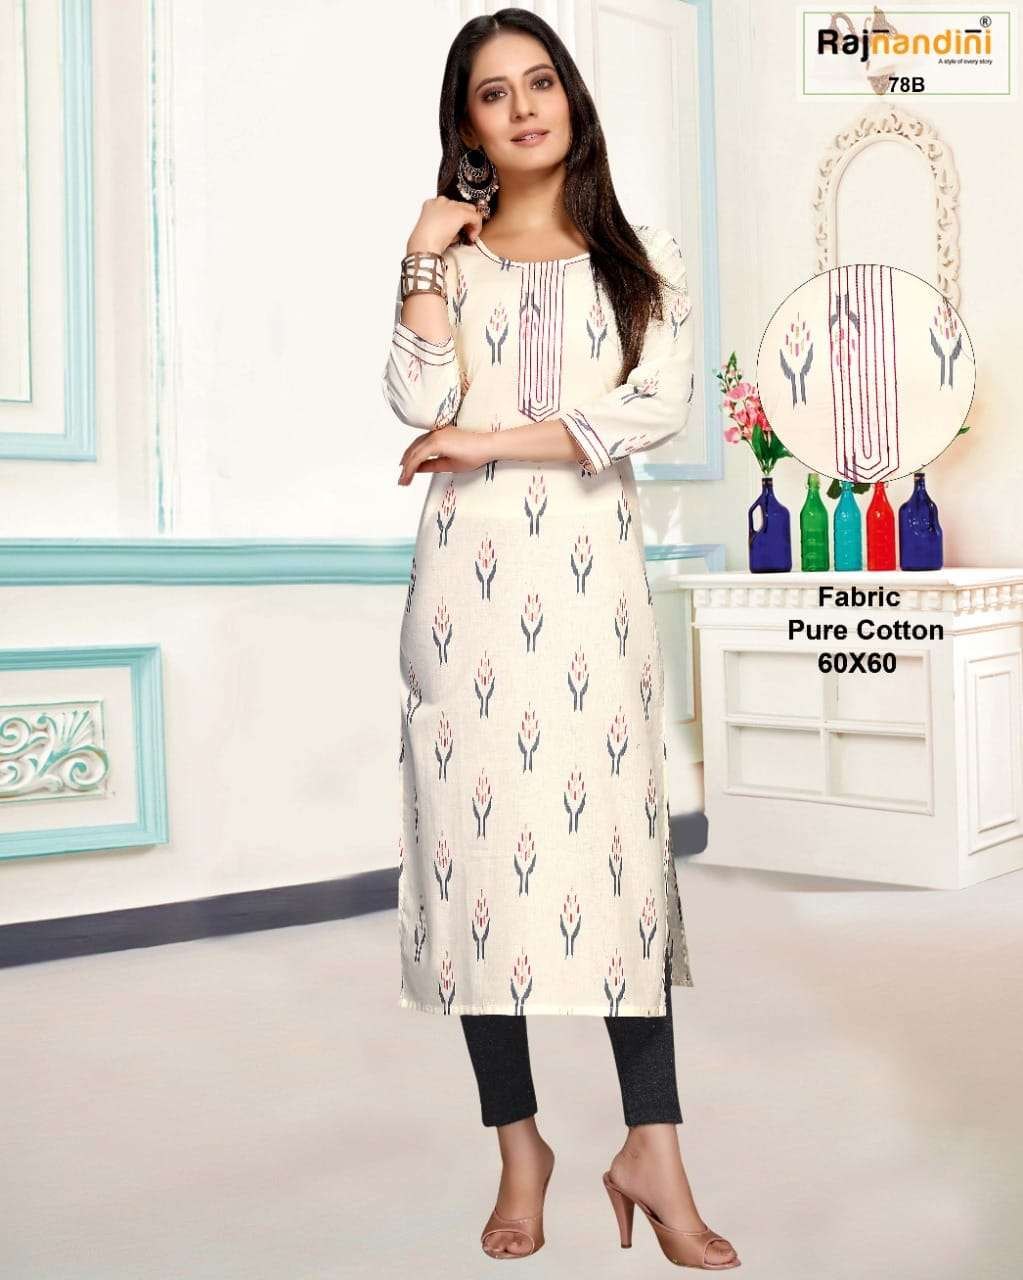 Rajnandini Vol 26 Jaipuri Print Cotton Kurti New Catalog Supplier